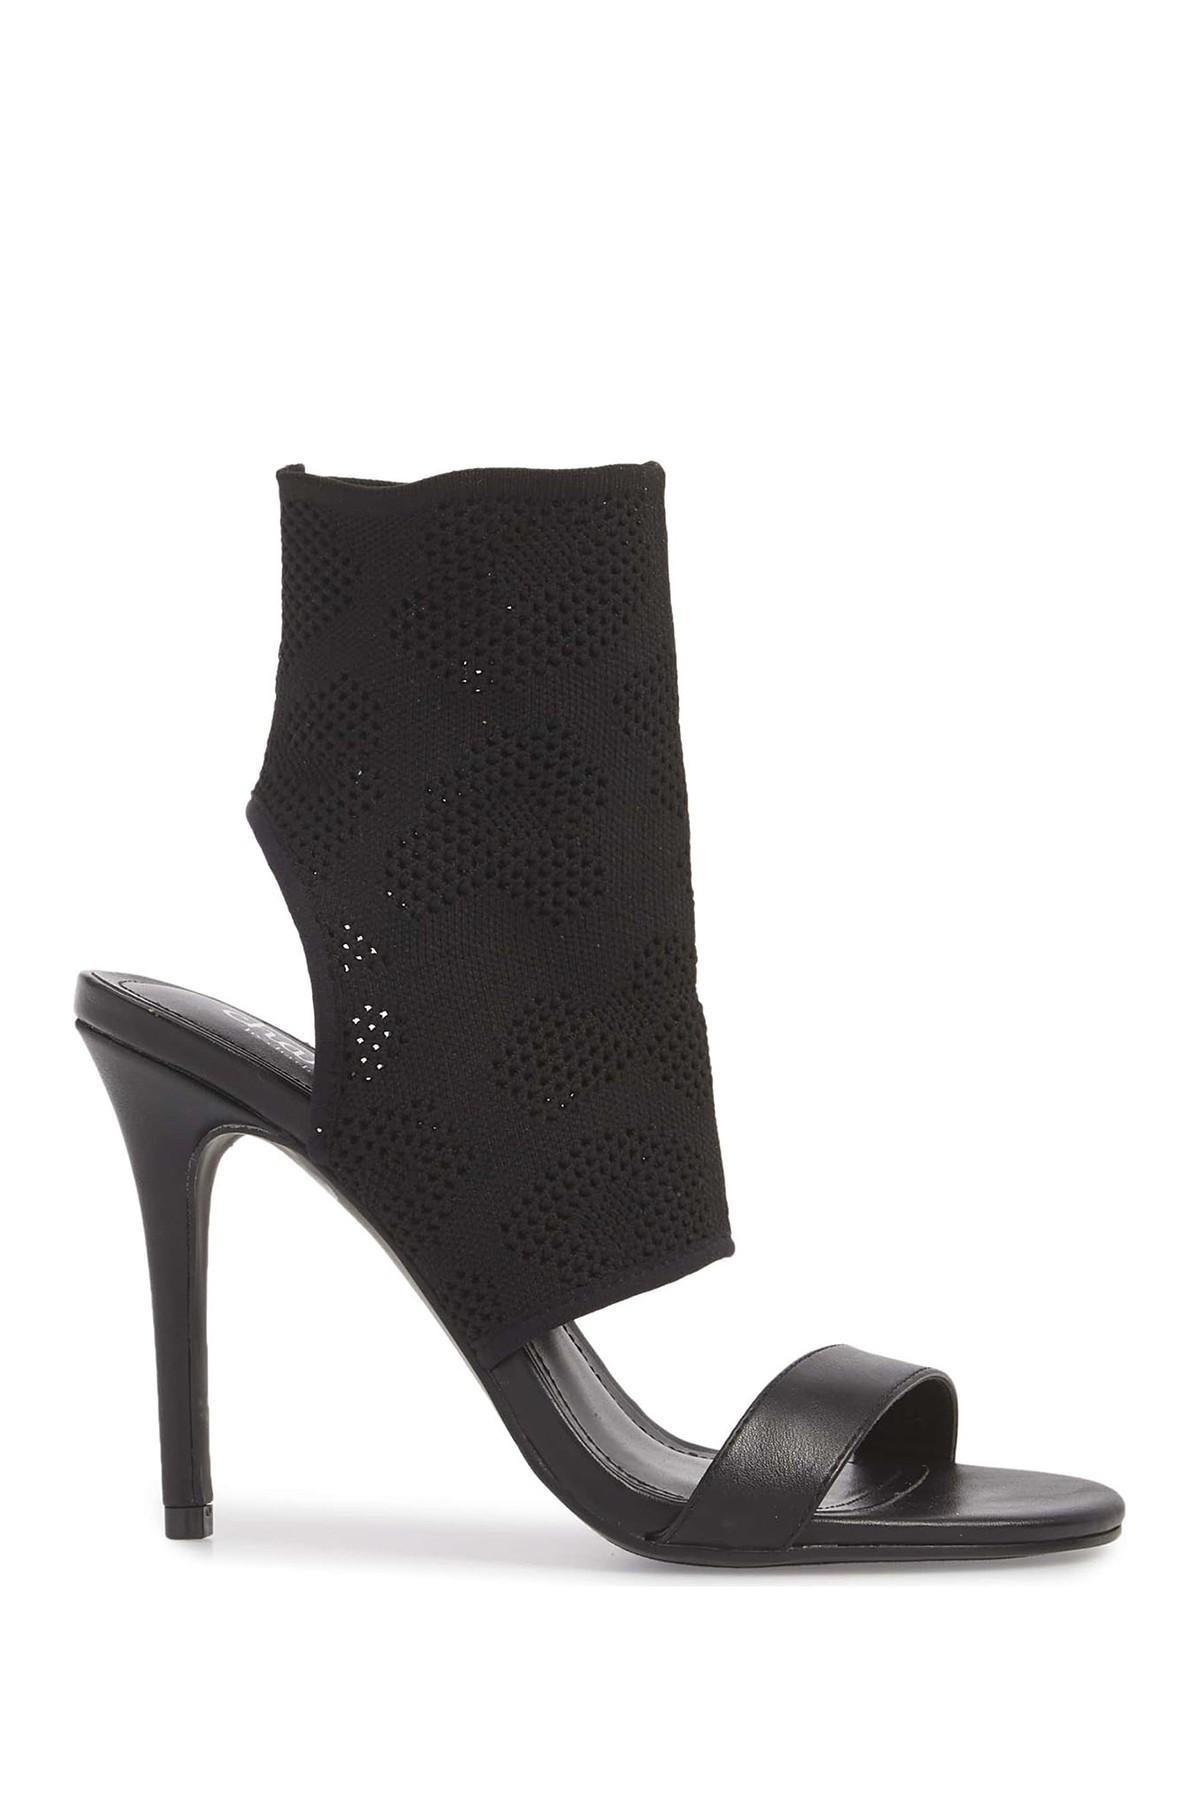 3019d359e36 Lyst - Charles David Remote Knit Sandal in Black